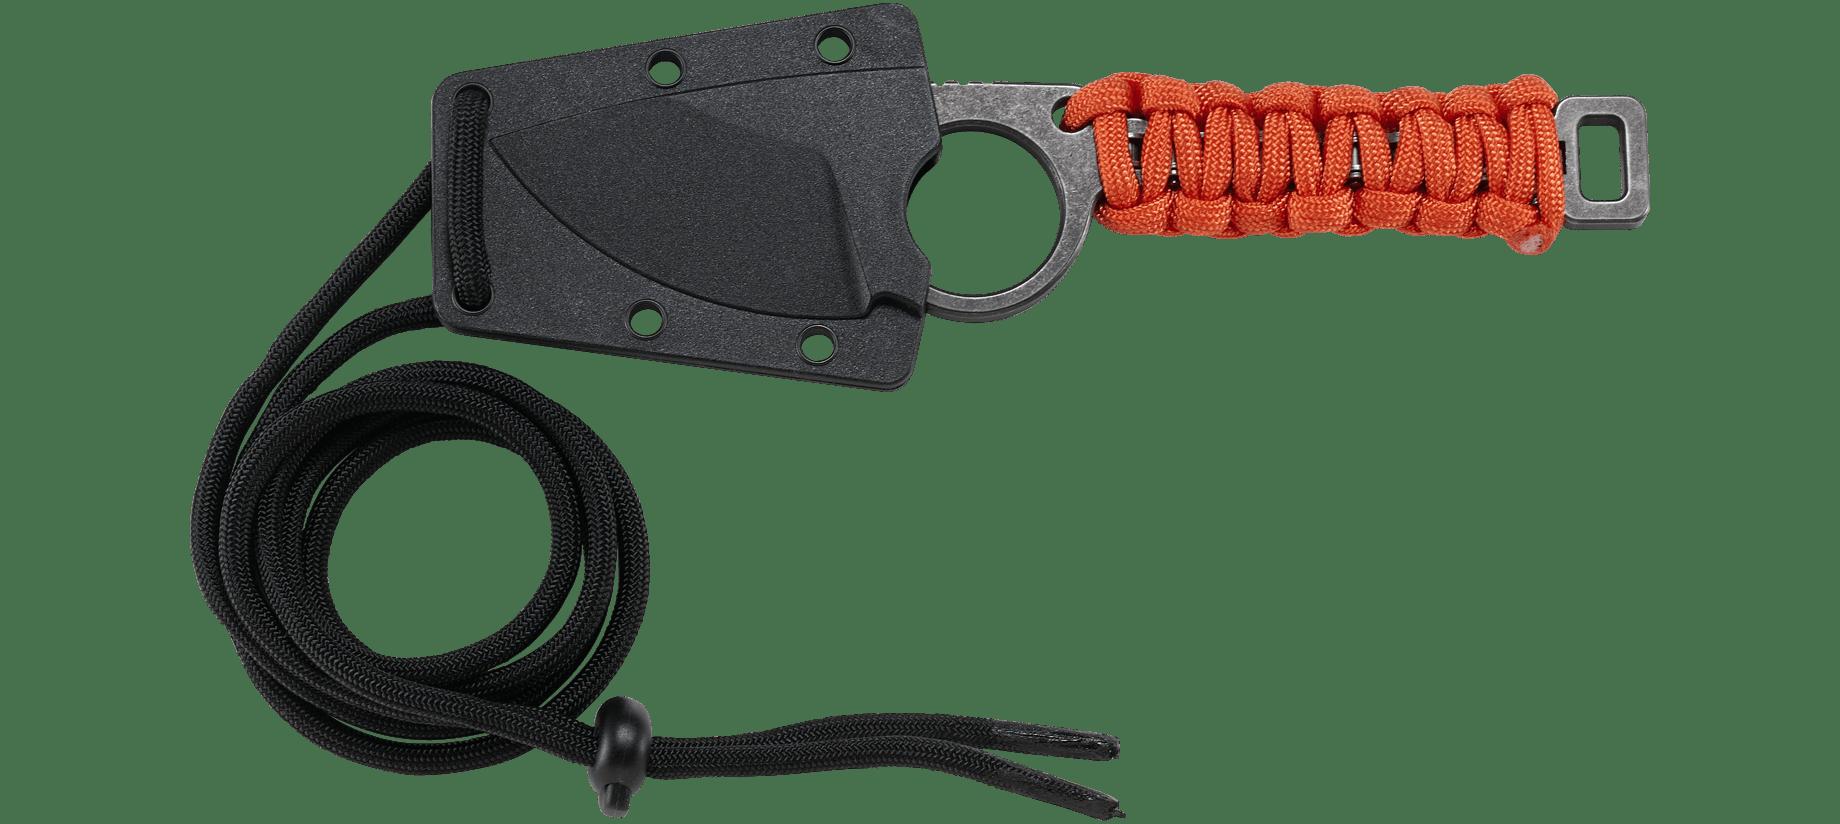 crkt tailbone fixed blade knife 2415 cr13mov steel stonewash knives